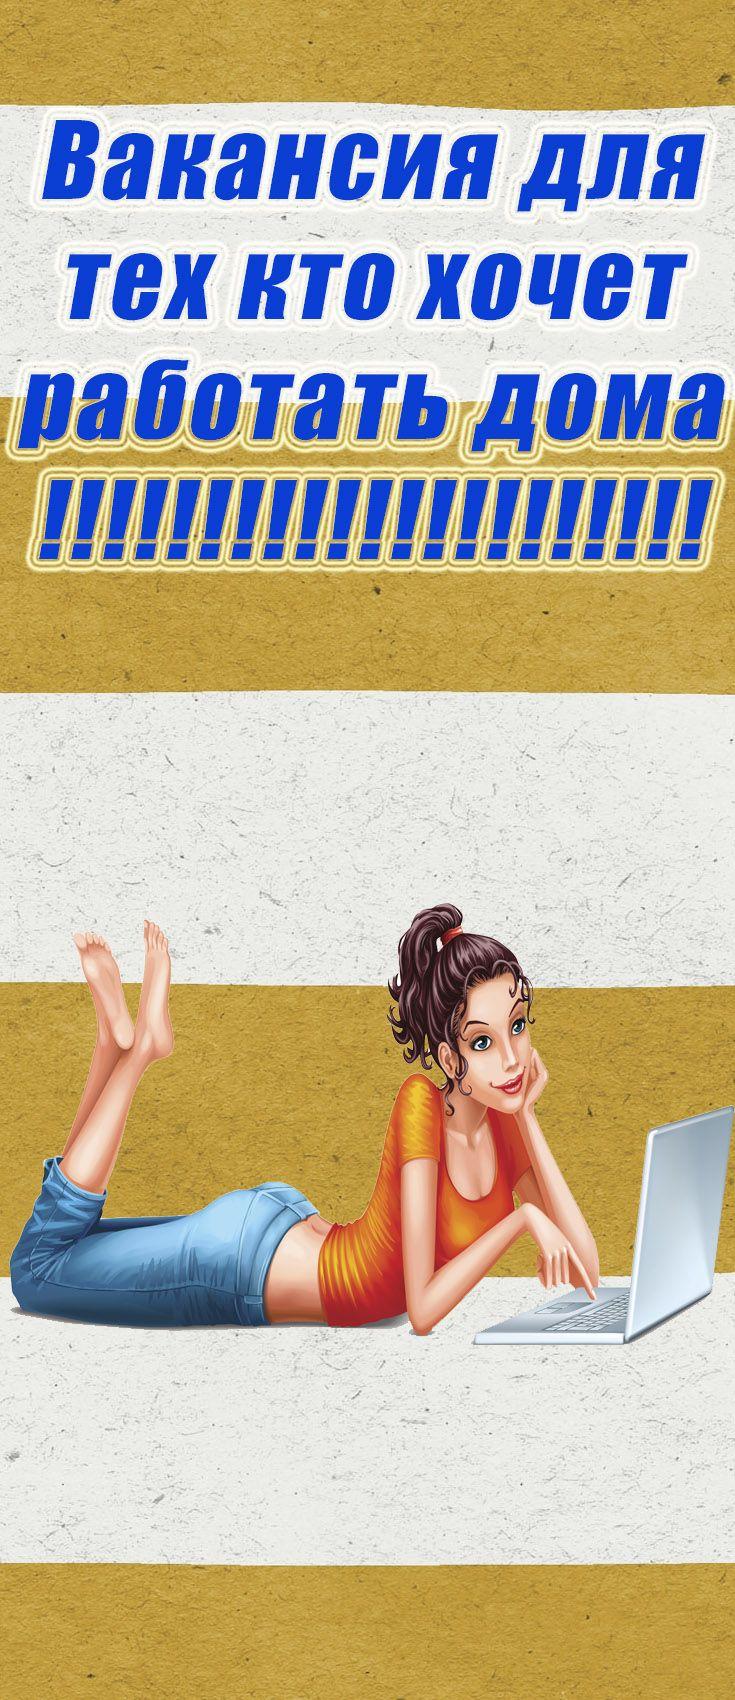 Работа дома вязание вакансии